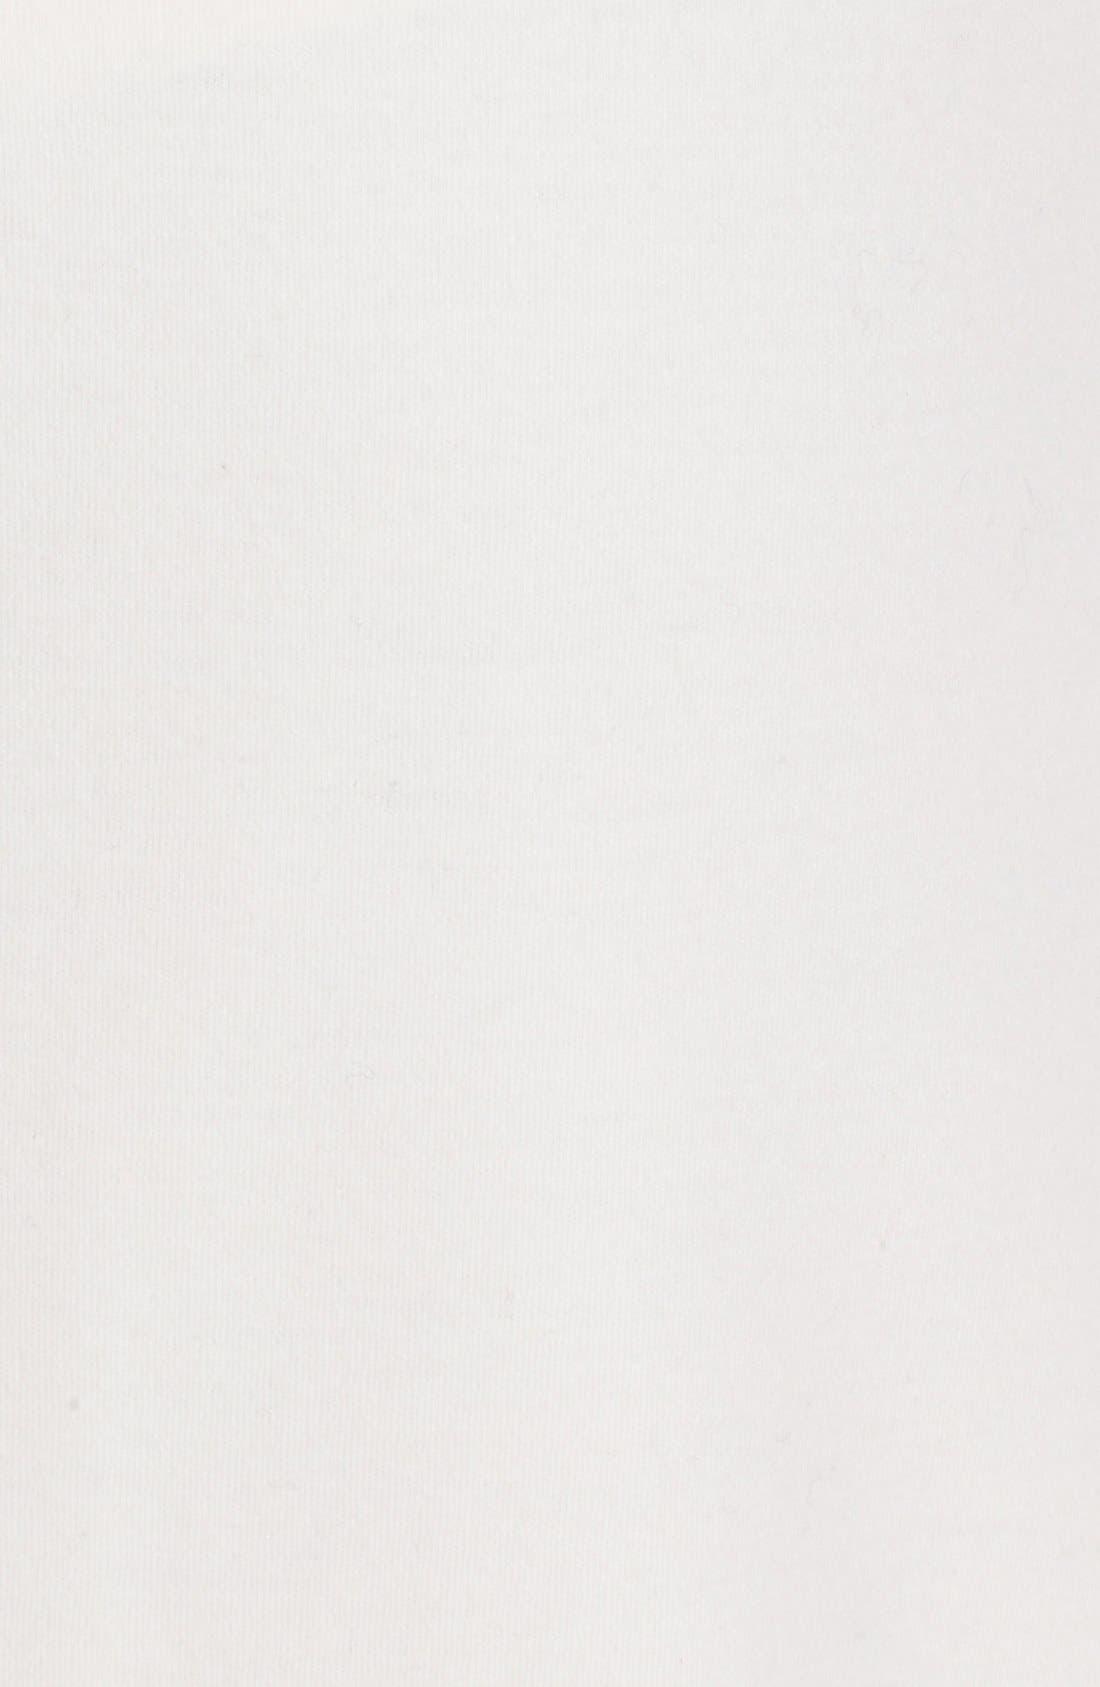 Alternate Image 3  - Max Mara 'Visita' Wool Jersey Pencil Skirt